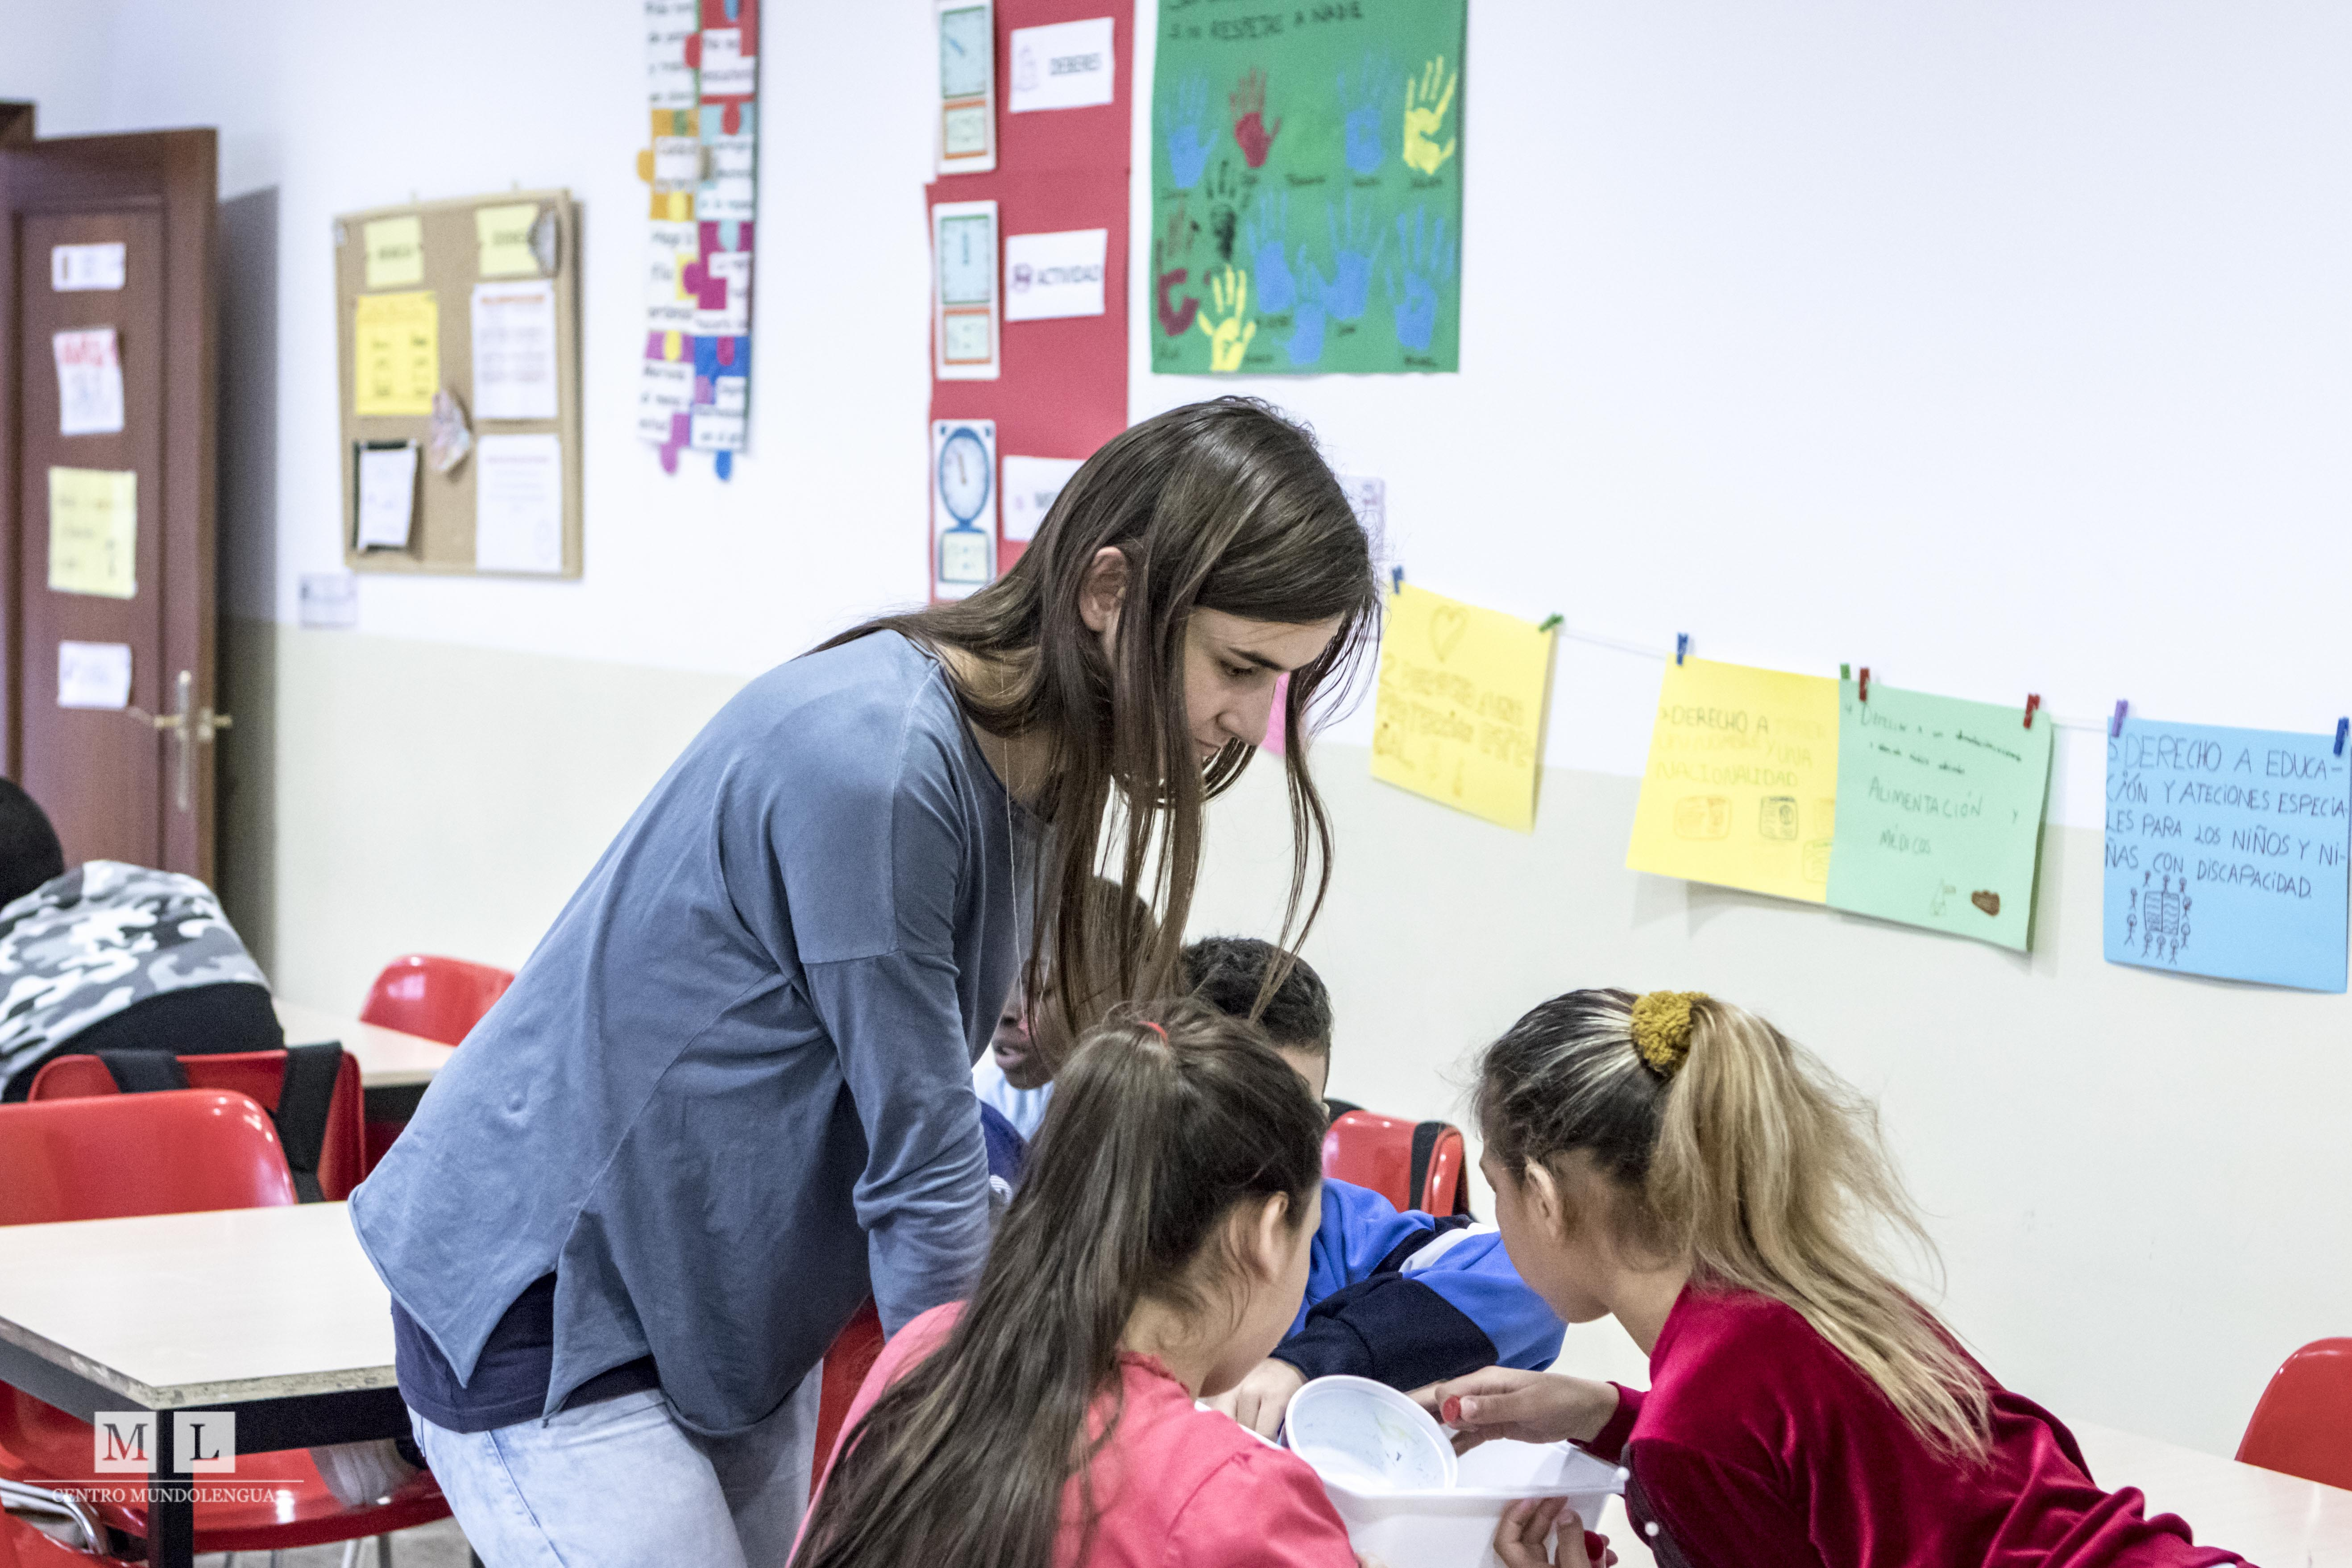 Community Service Organization - Volunteer Abroad in Spain!  1